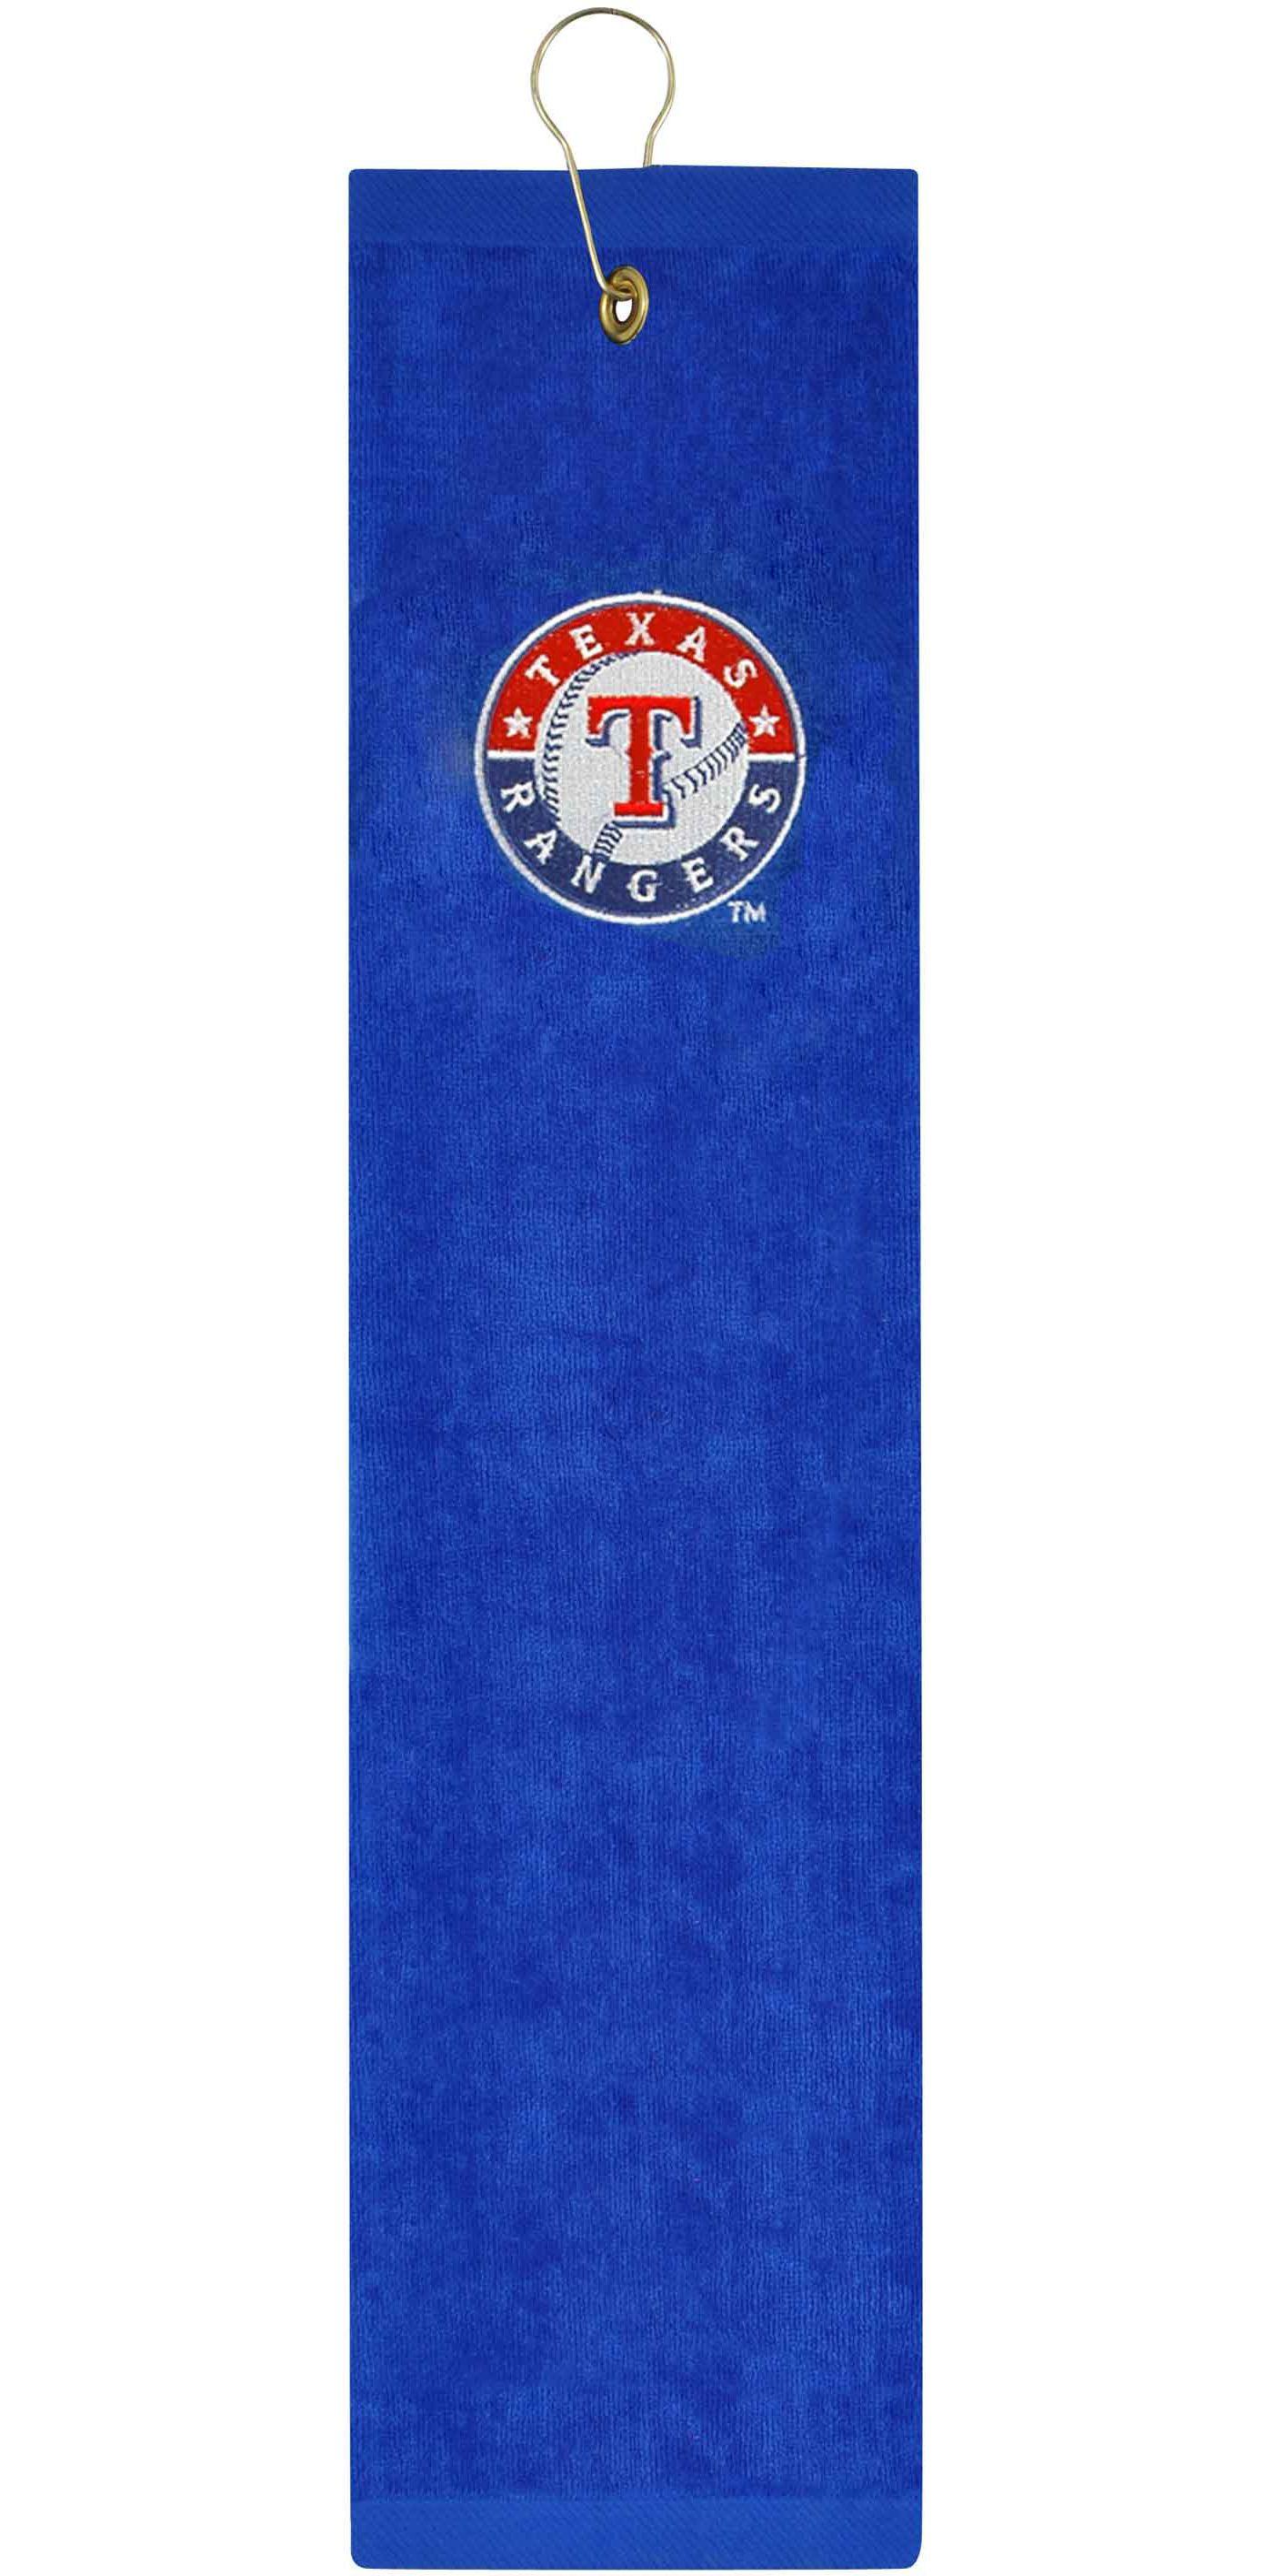 McArthur Sports New York Rangers Embroidered Tri-Fold Towel